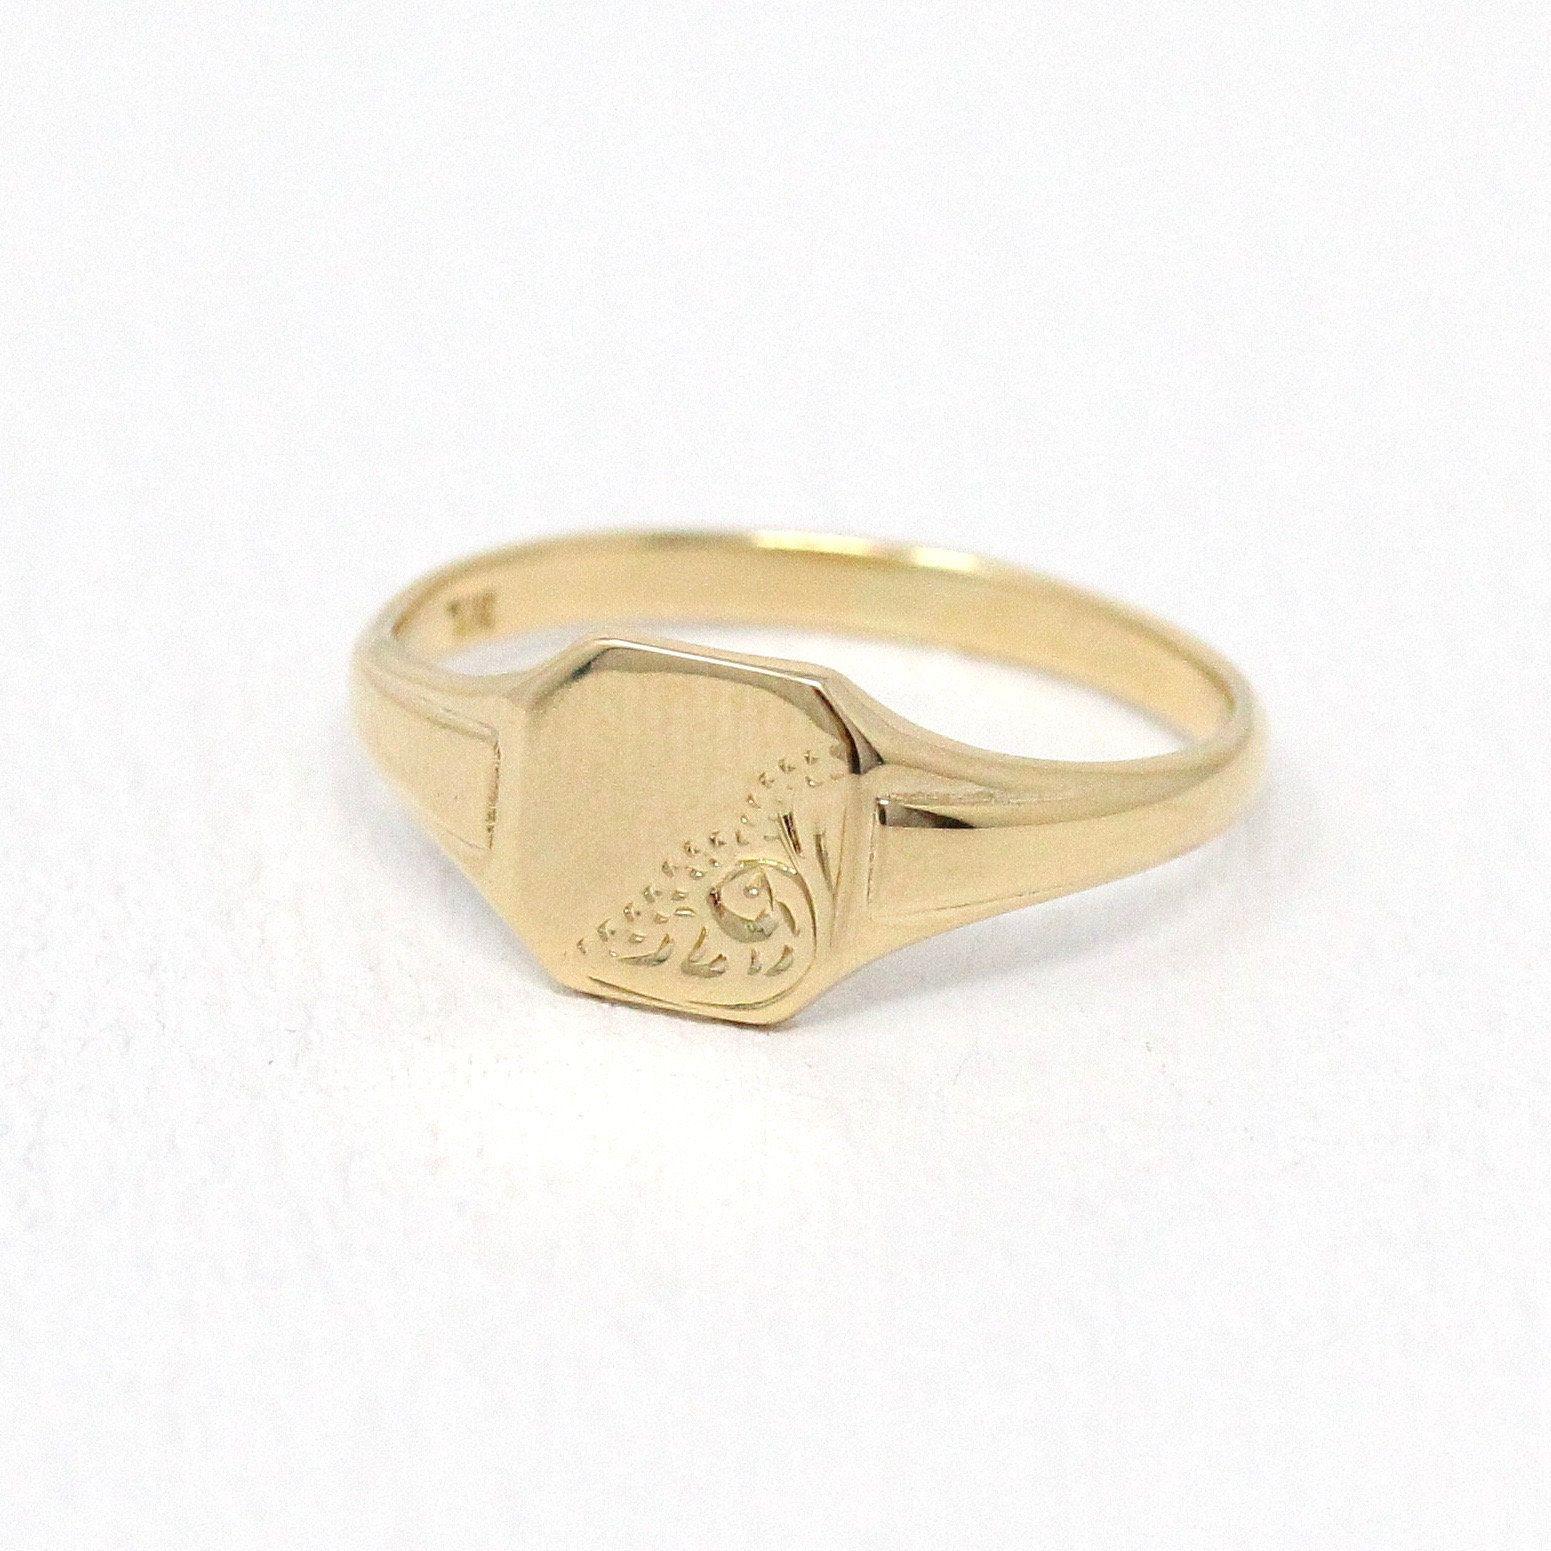 1940s Size 4 34 Rectangular Flower Fine Jewelry Sale Vintage Onyx Ring 10k Rosy Yellow Gold Diamond Black Gemstone Statement